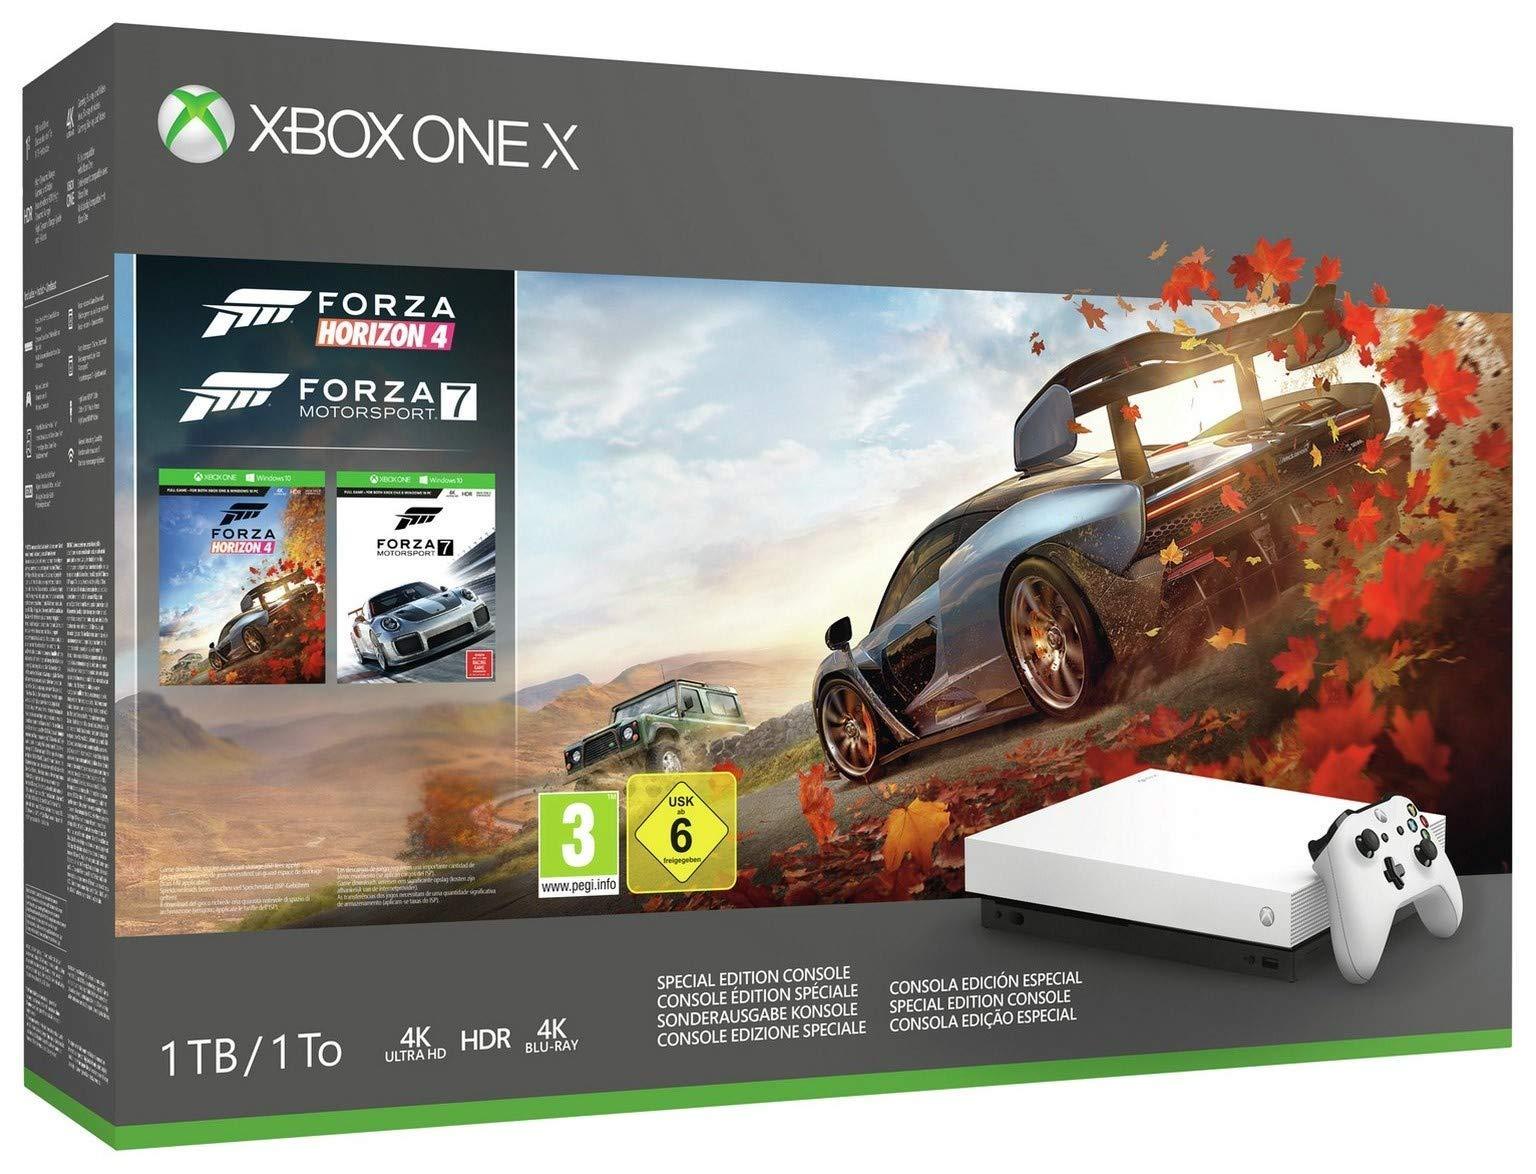 Microsoft Limited Edition White Xbox One X 1TB Forza Horizon 4 and Motorsport 7 Bundle (Renewed)